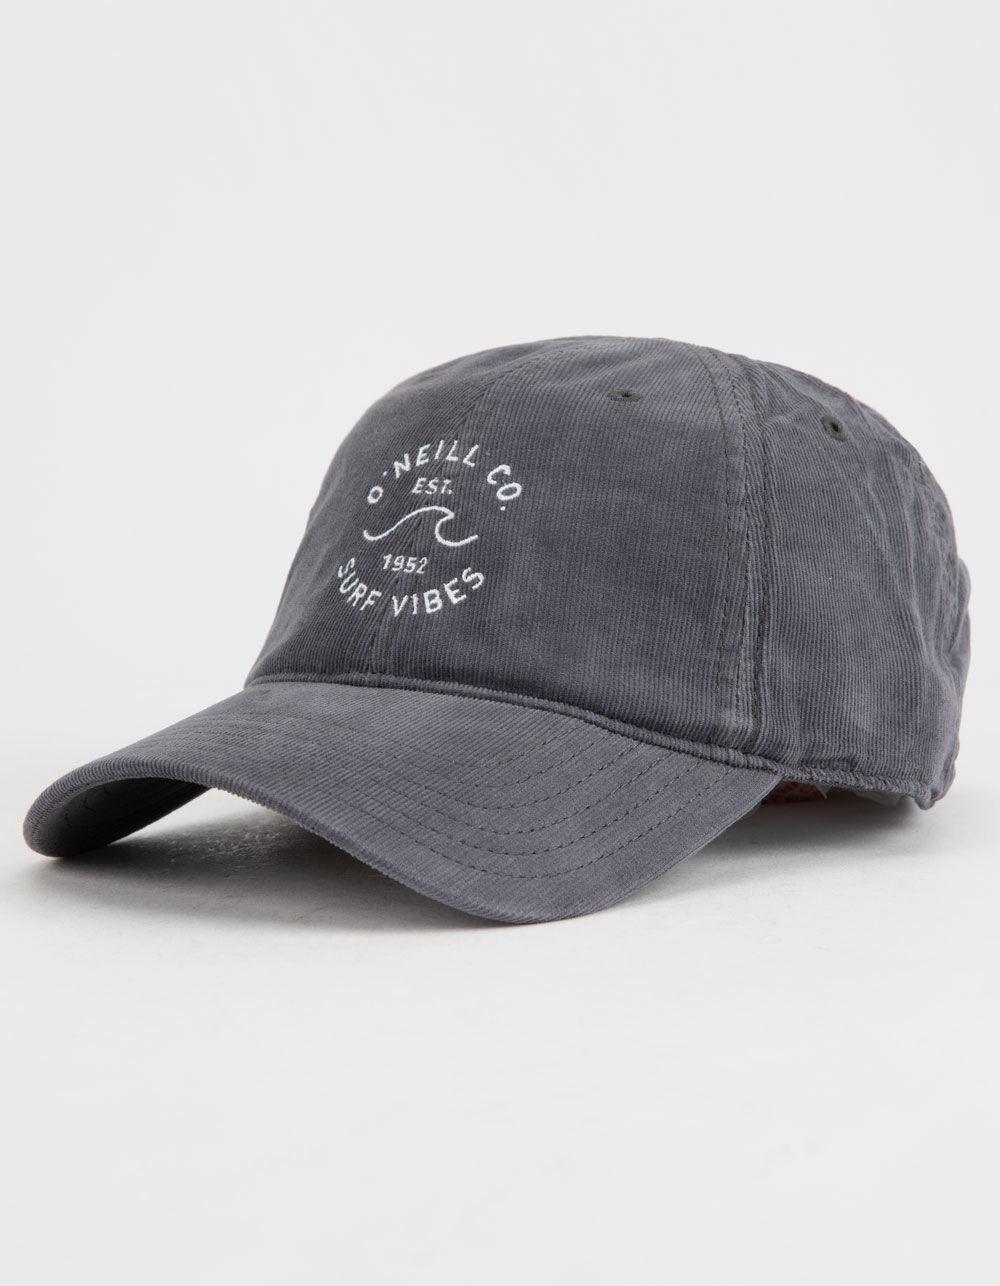 Lyst - O neill Sportswear Surf Chaser Womens Strapback Hat in Gray 28da36e6b23